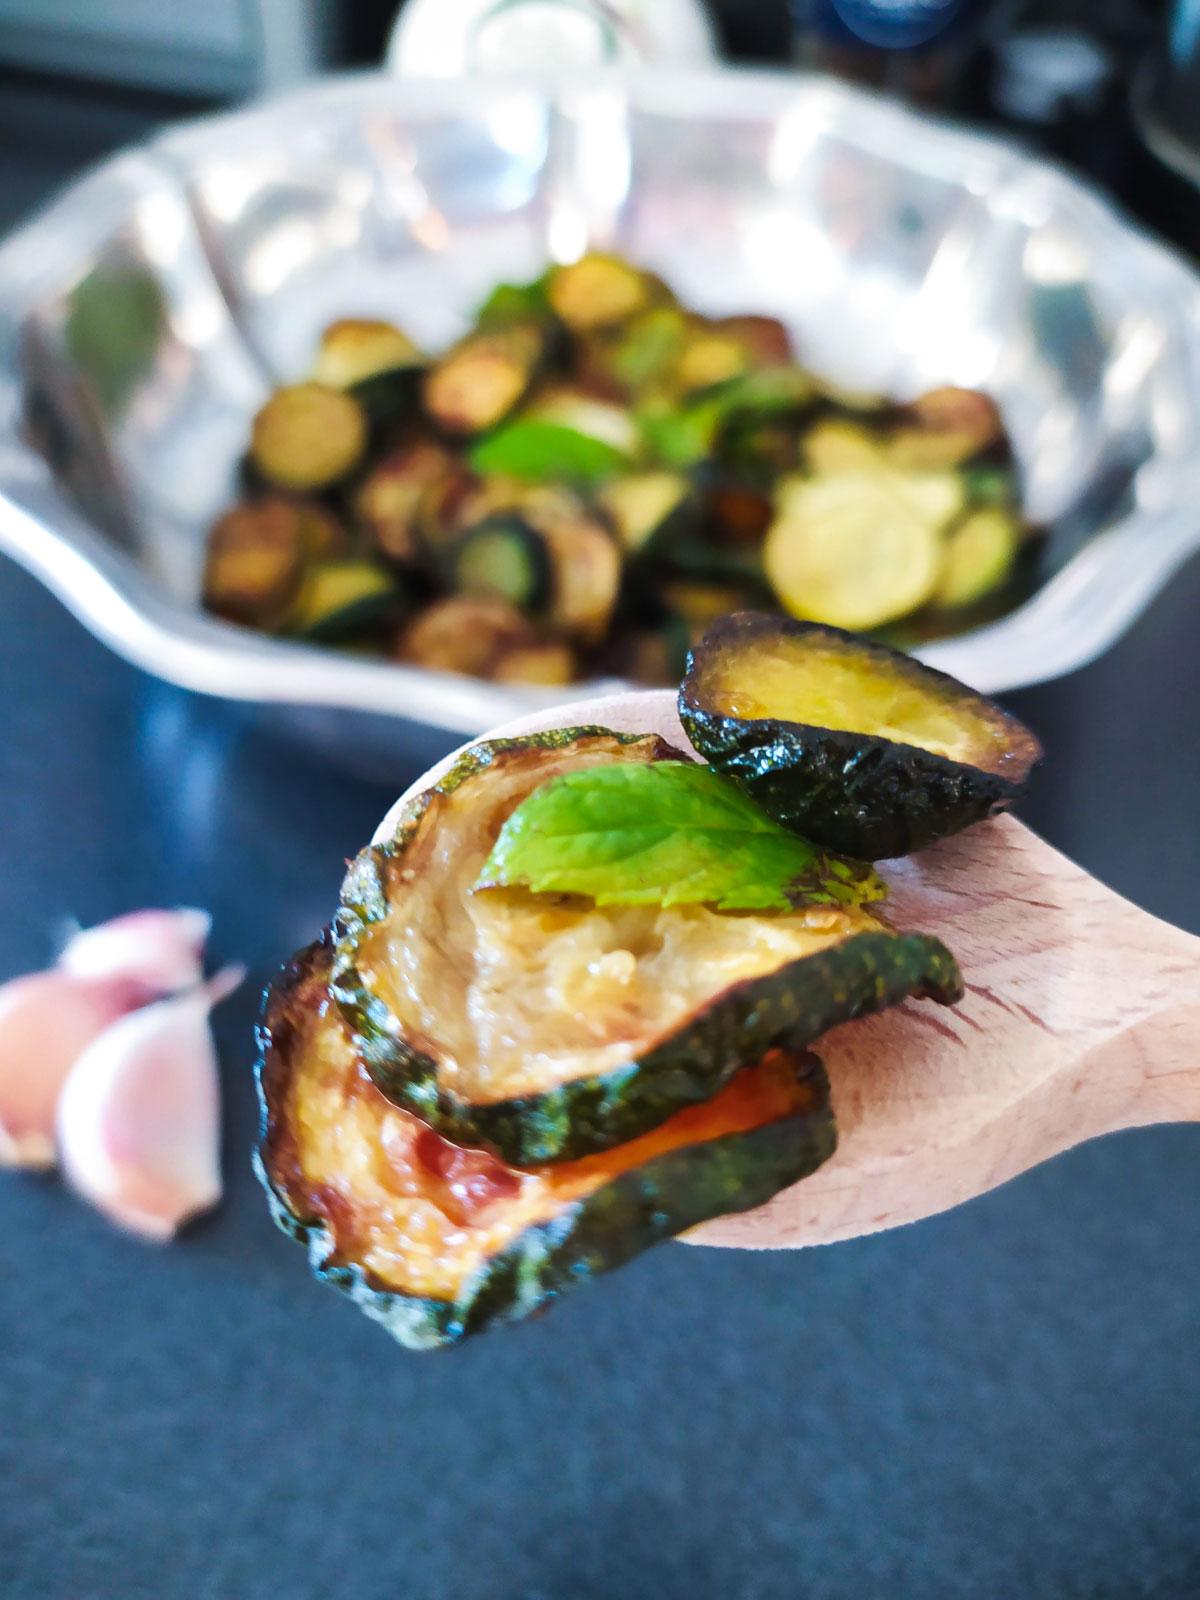 zucchini alla scapece close up with wooden spoon